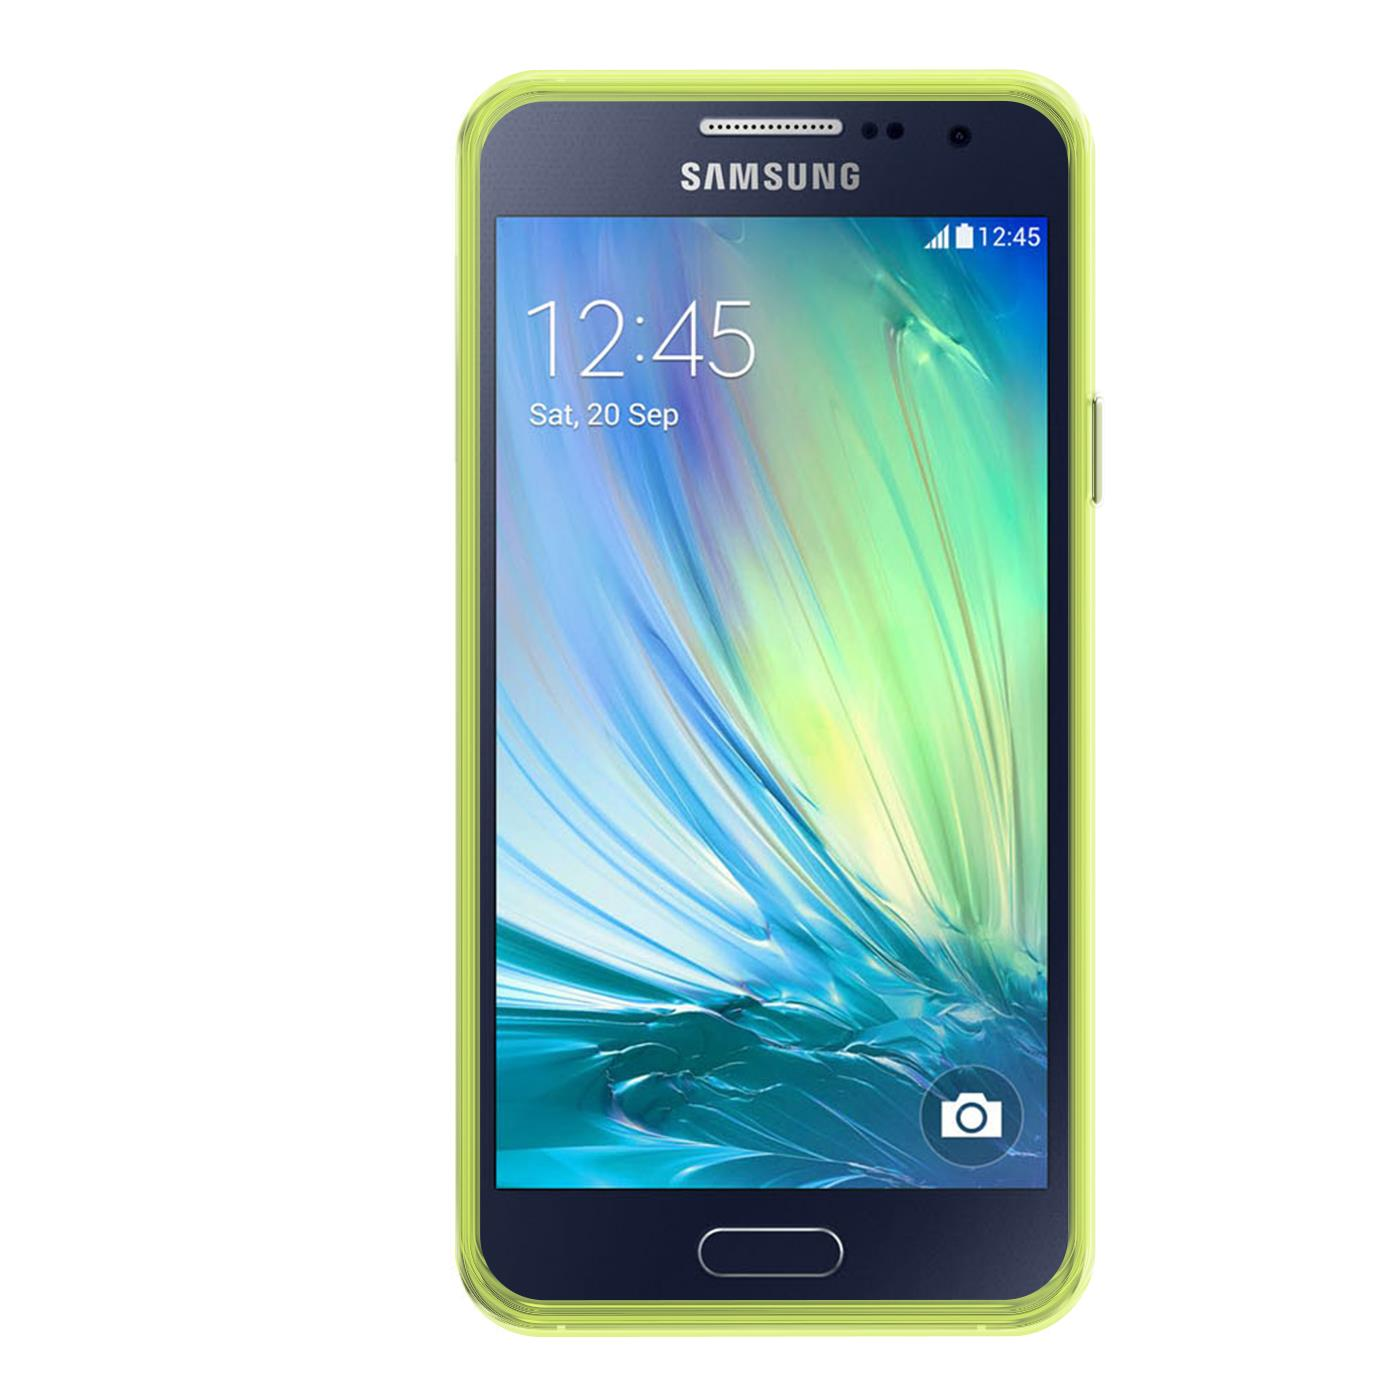 Samsung-Galaxy-A3-2015-Thin-Silicone-Clear-Case-Cover-Ultra-Slim-Shockproof-Gel Indexbild 11